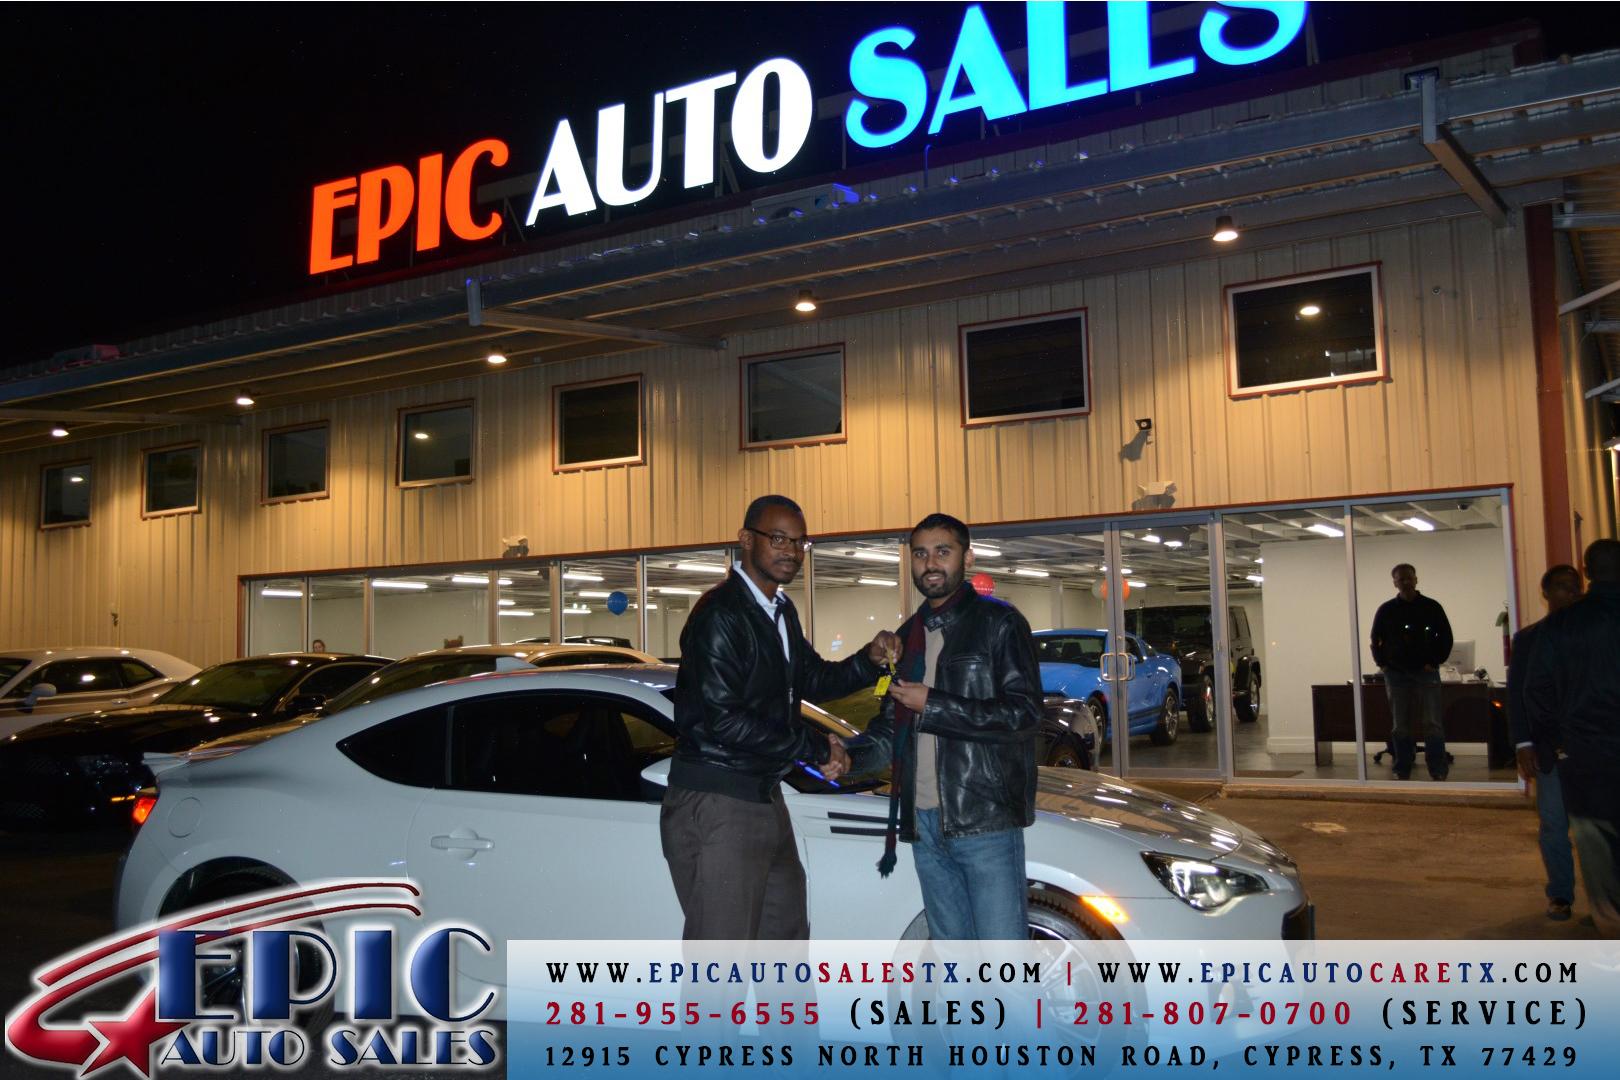 Epic Auto Sales image 9